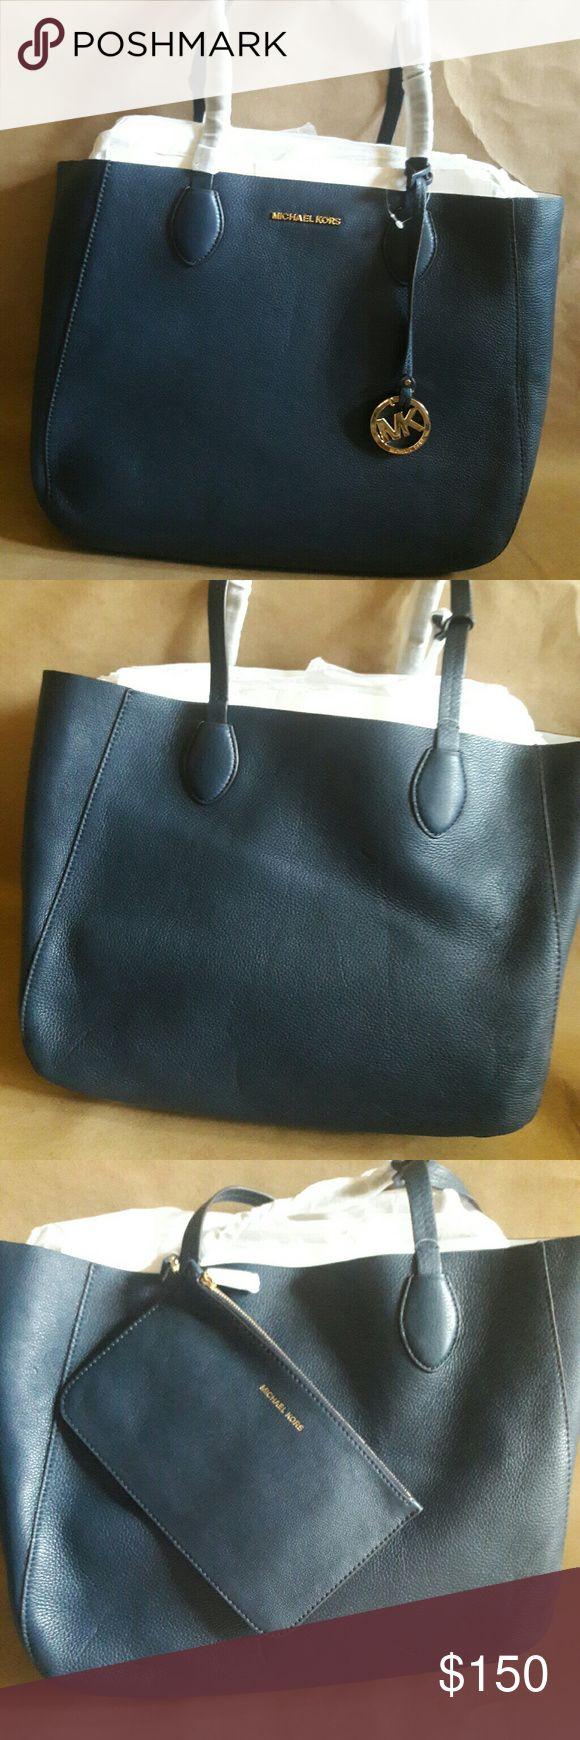 Michael Kors Handbag Large Micheal Kors Handbag with tote. Michael Kors Bags Shoulder Bags